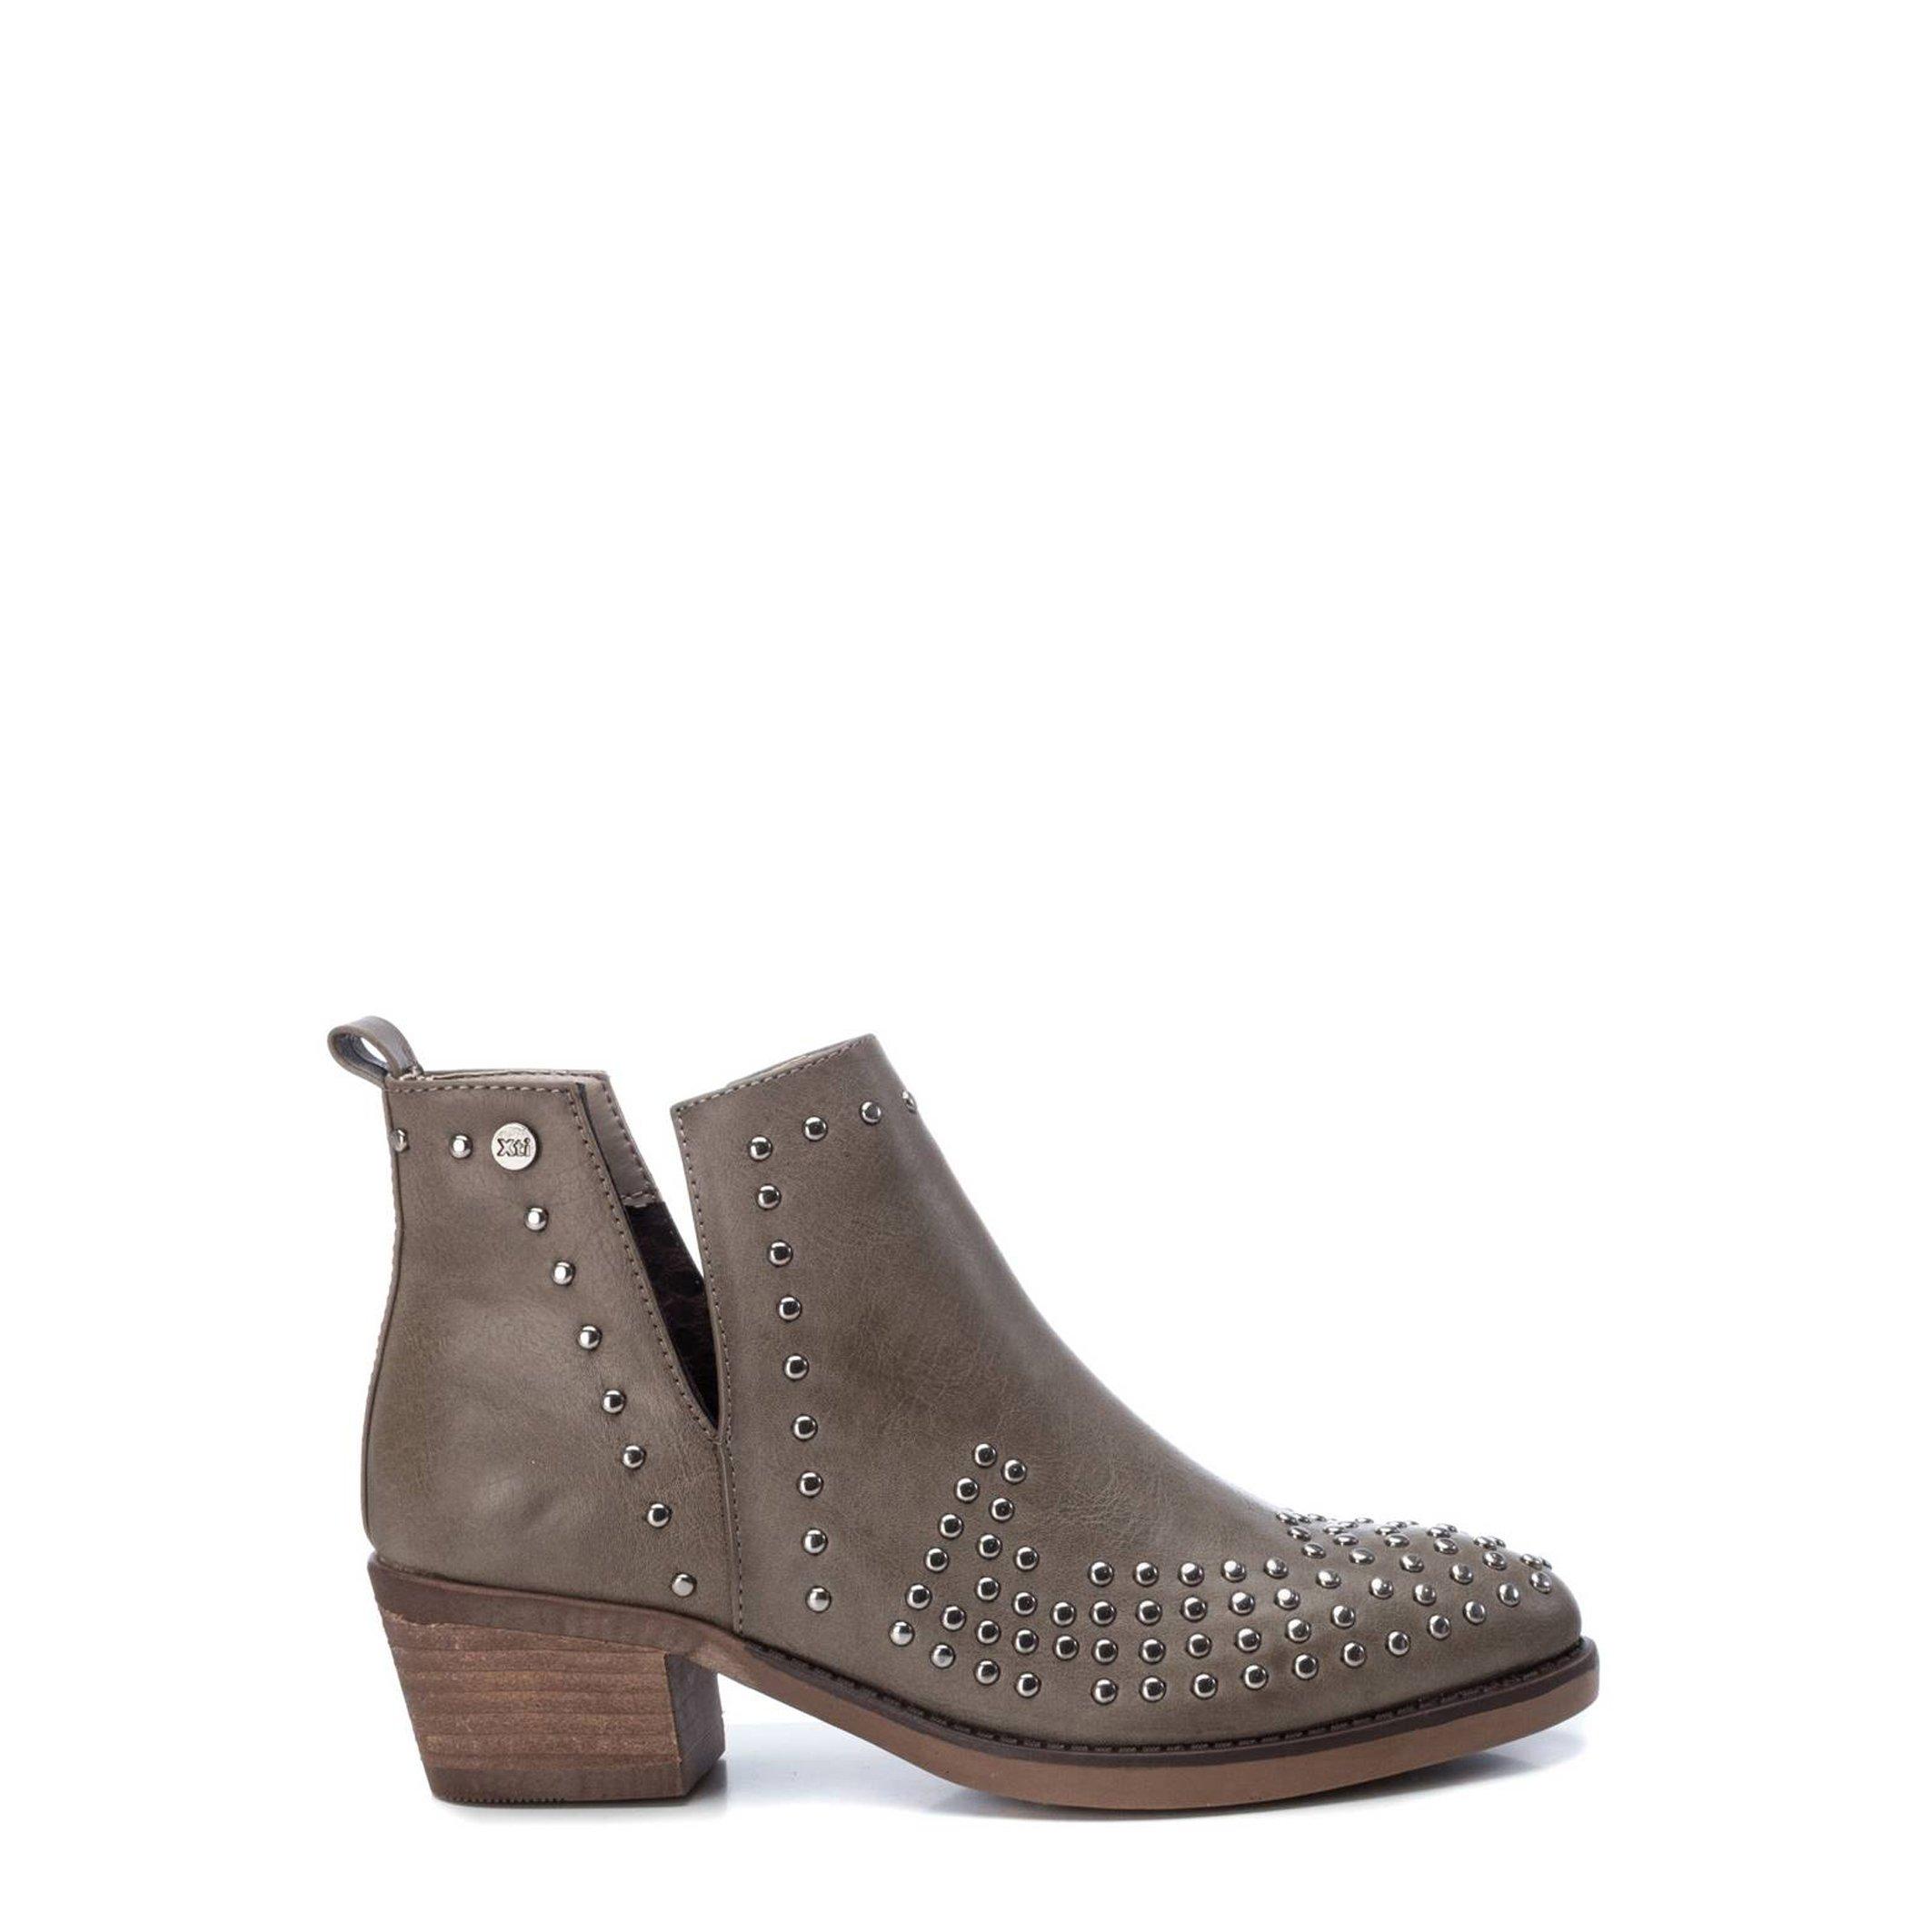 Xti Women's Ankle Boots Various Colors 49476 - brown-1 EU 37